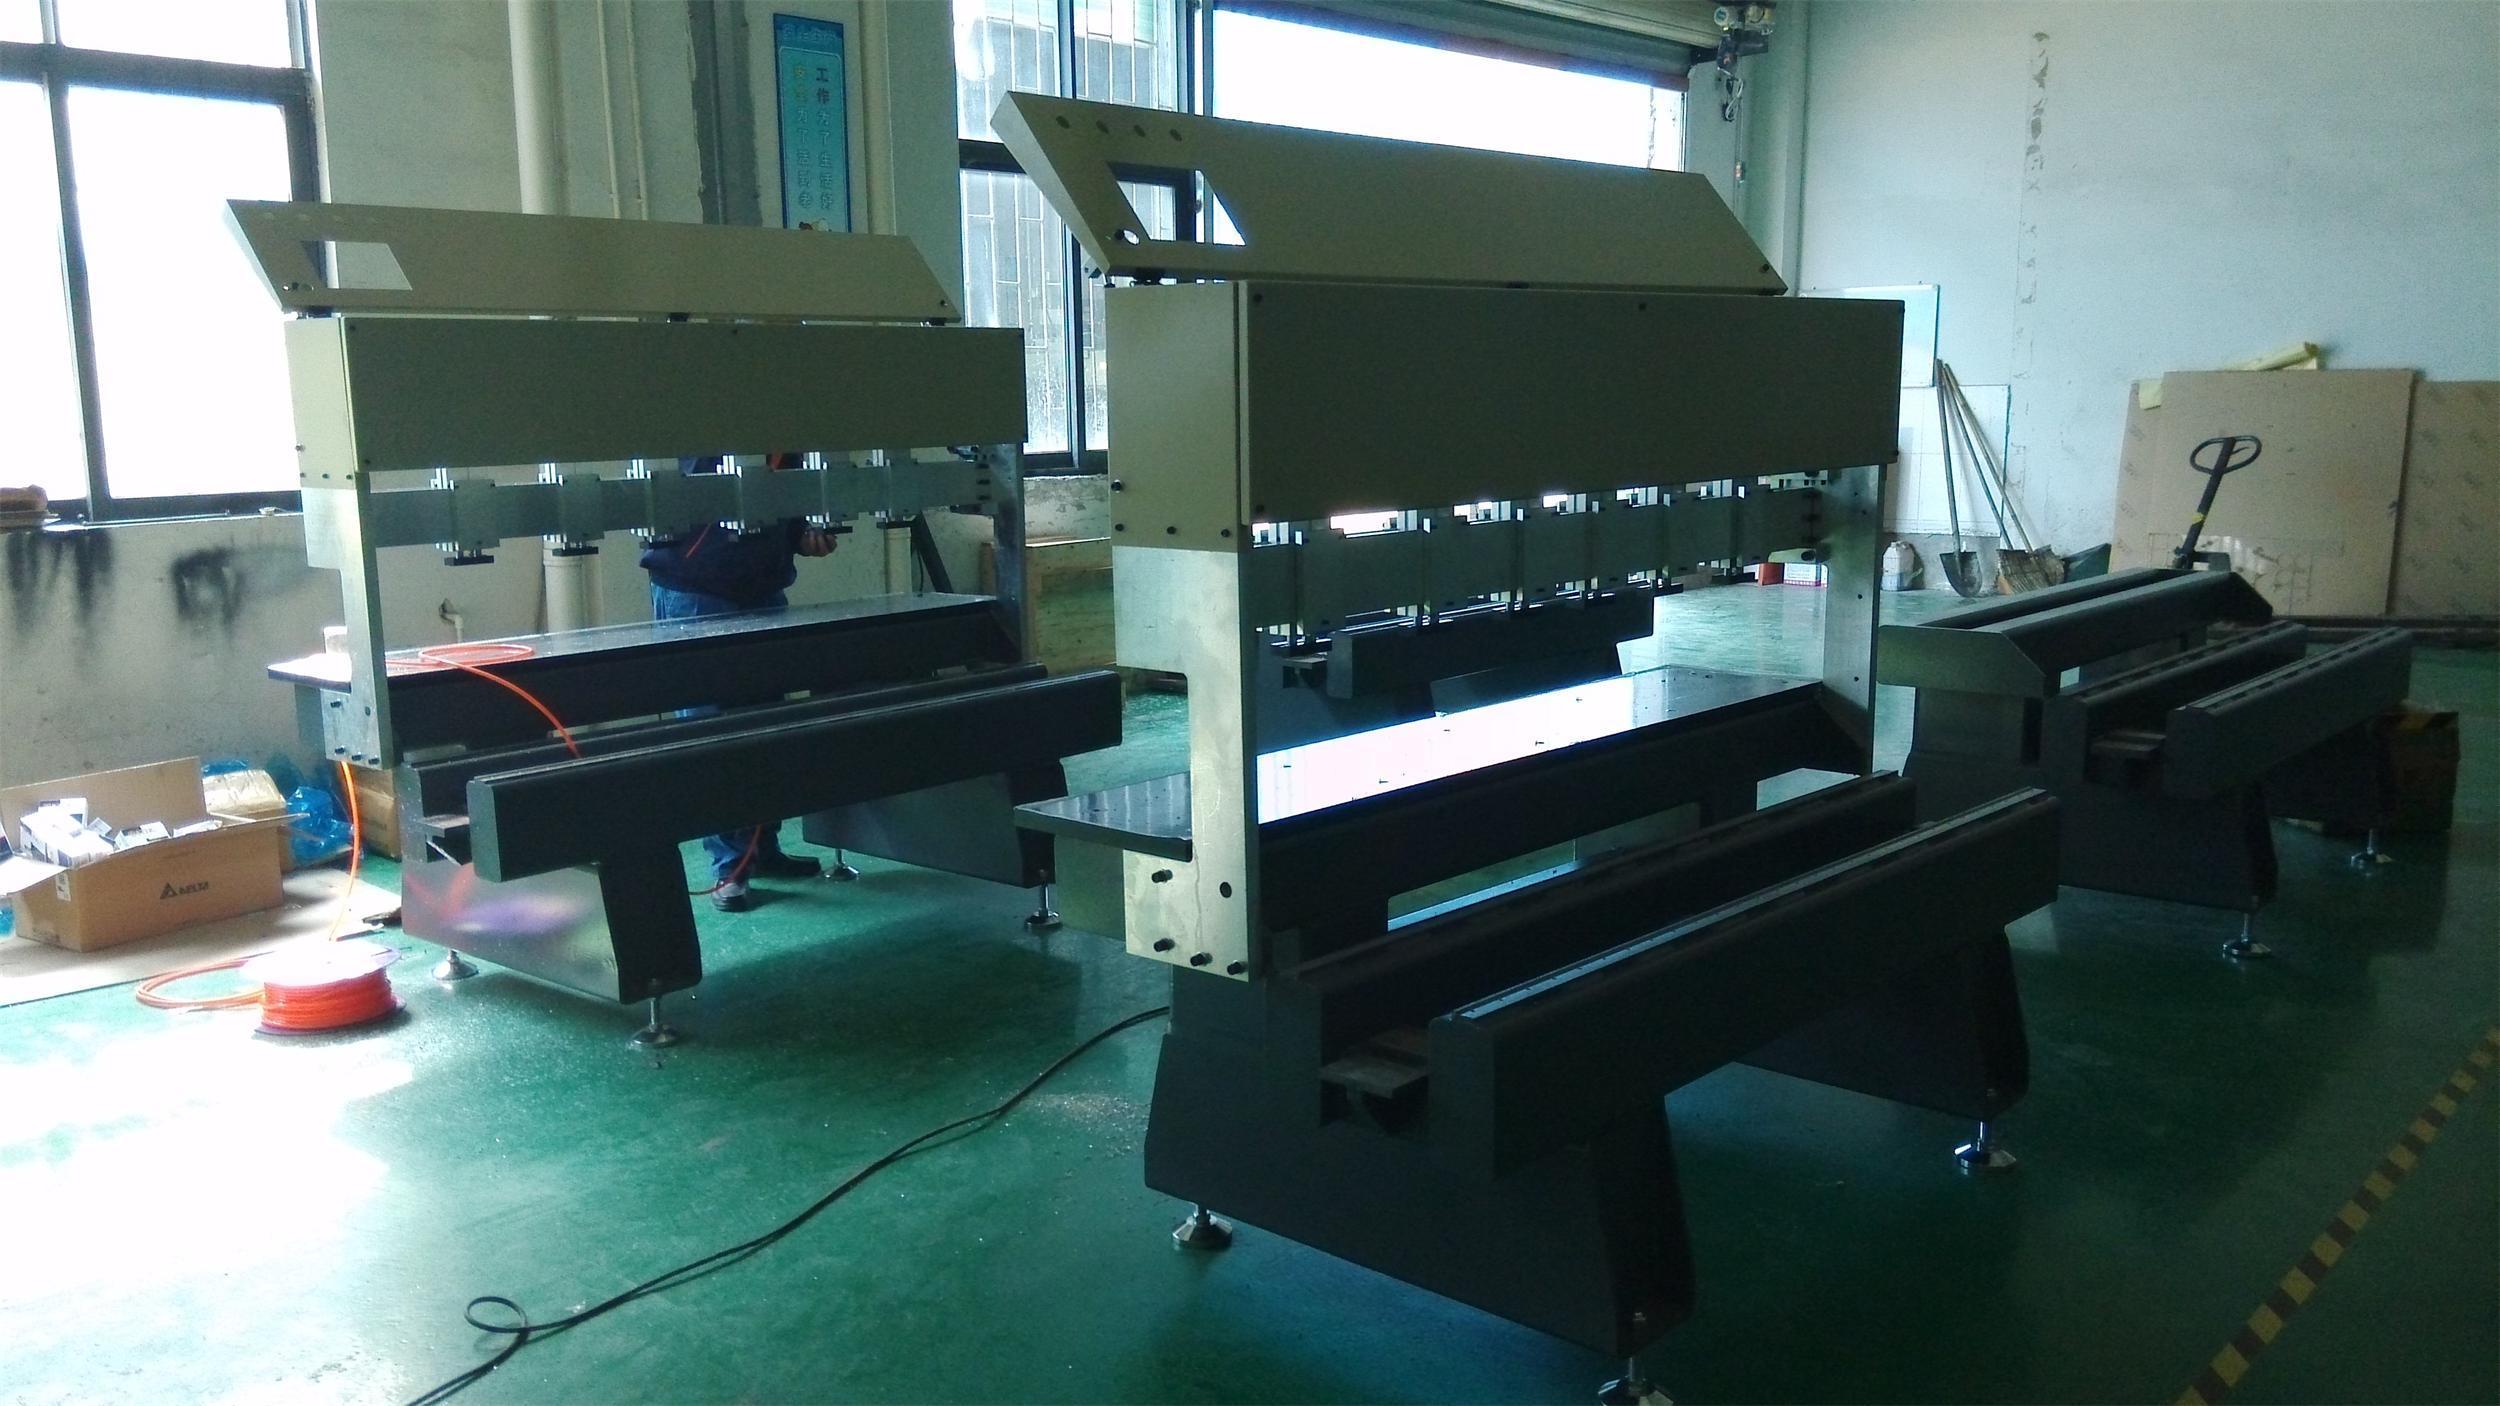 The Latest LED/Acrylic Products Polisher Equipment